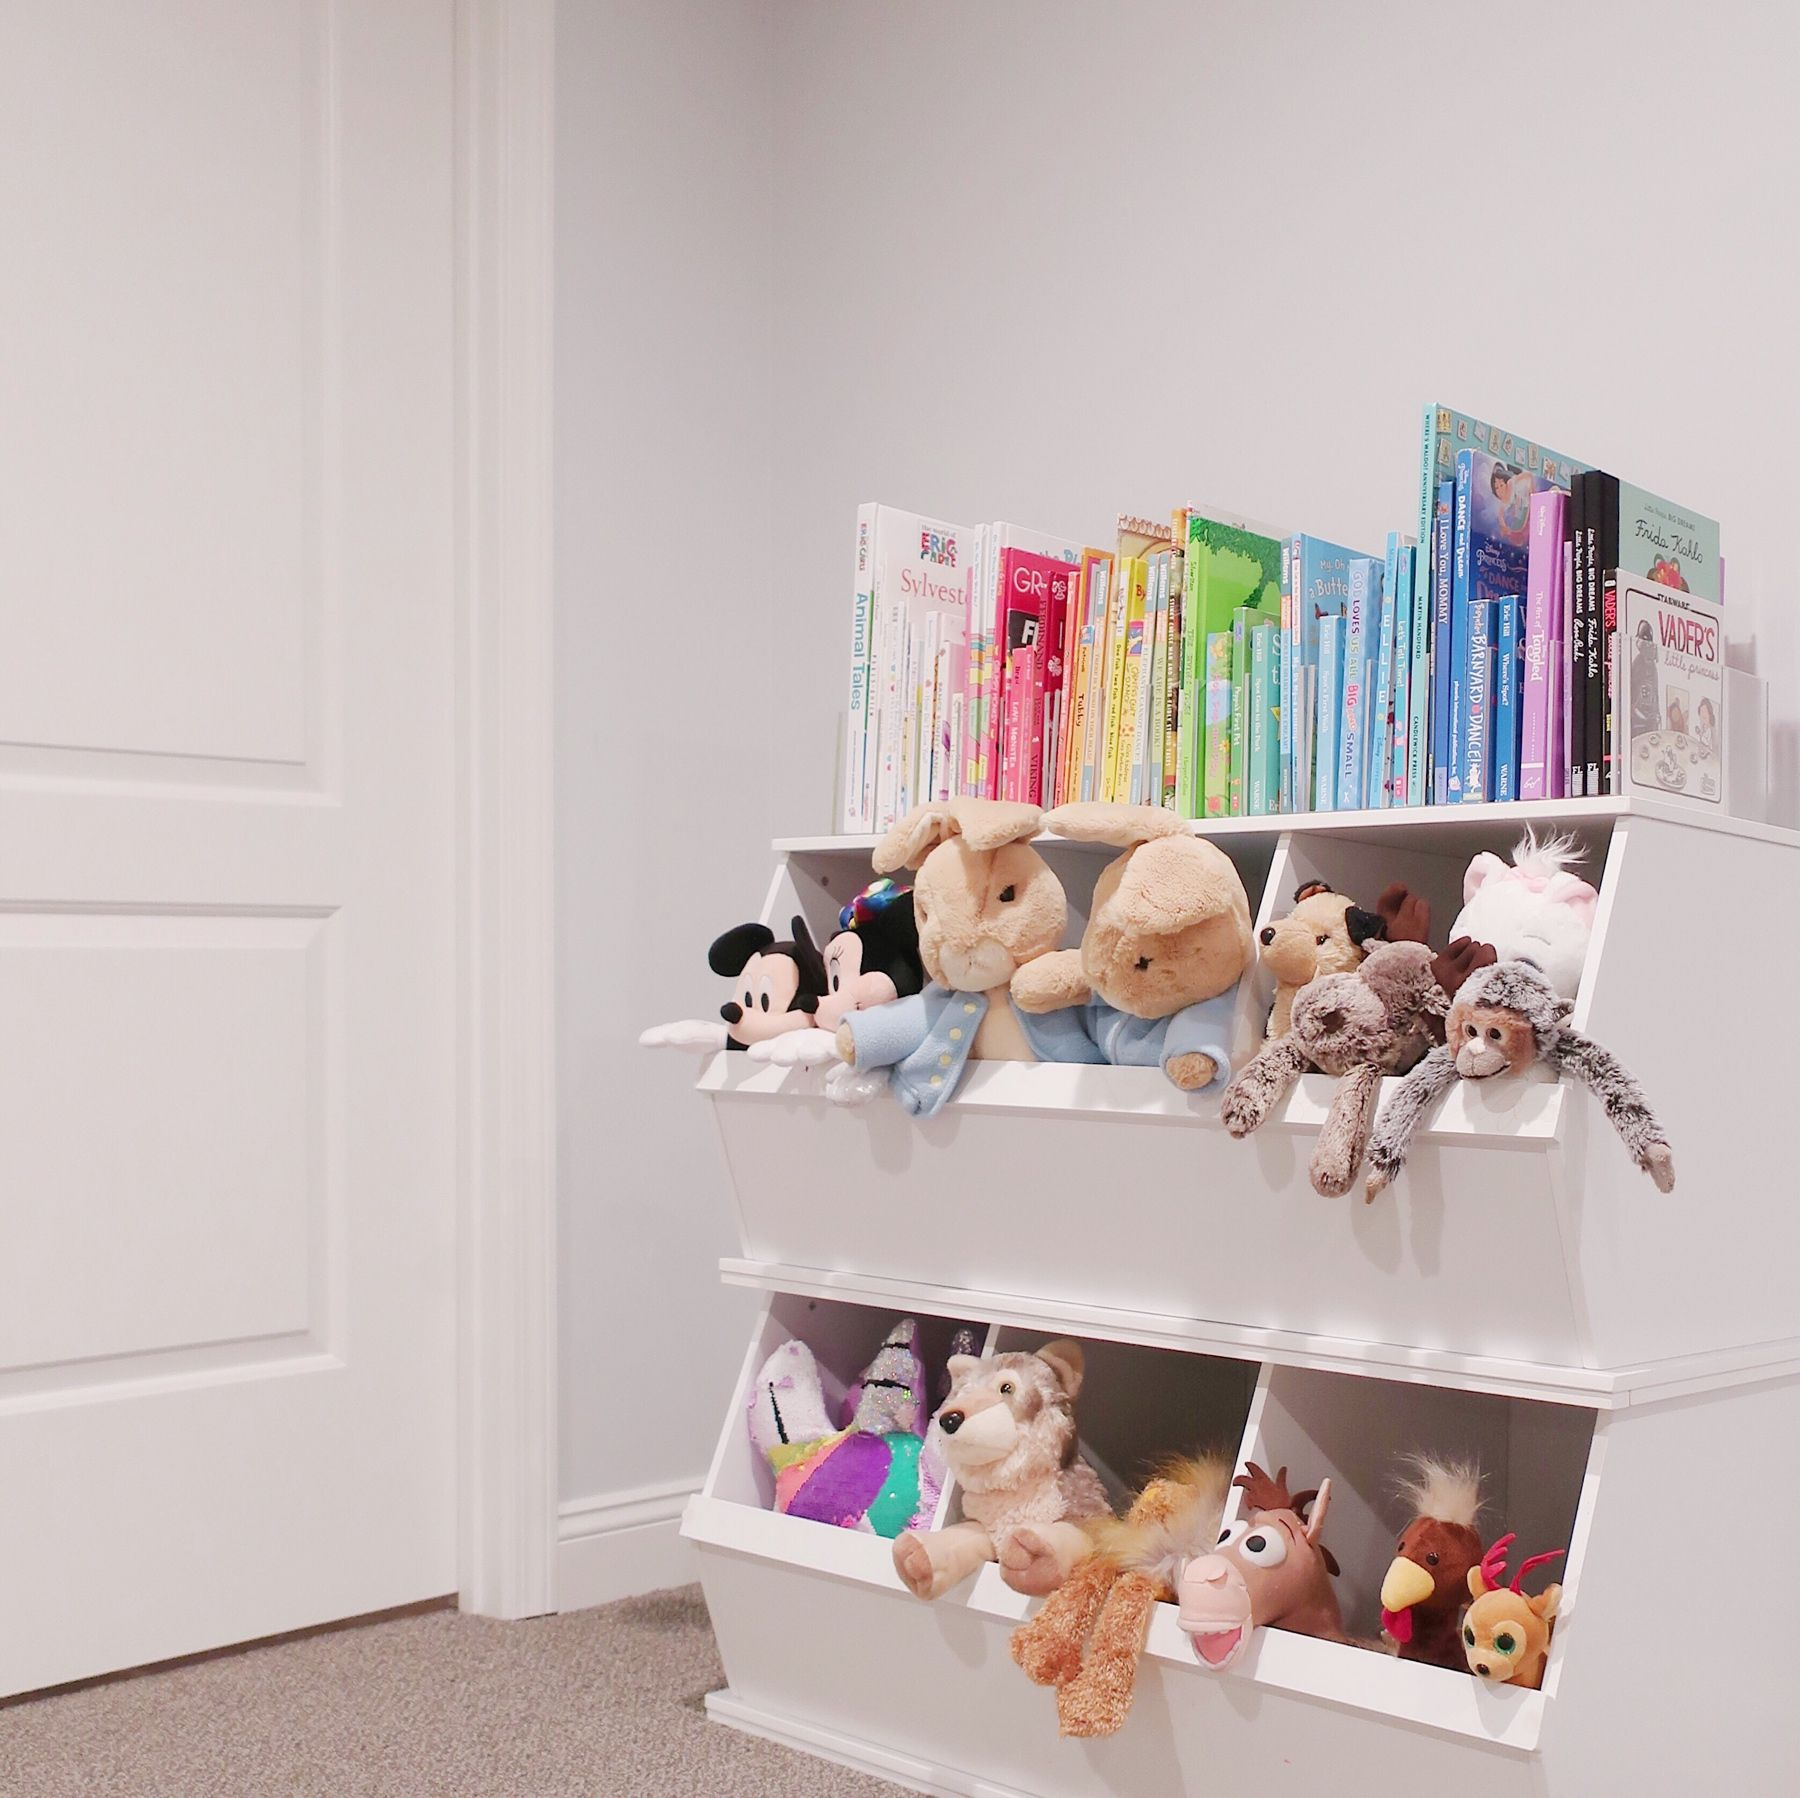 Toy Cubbies Kids Room Design Kids Room Organization Baby Room Design